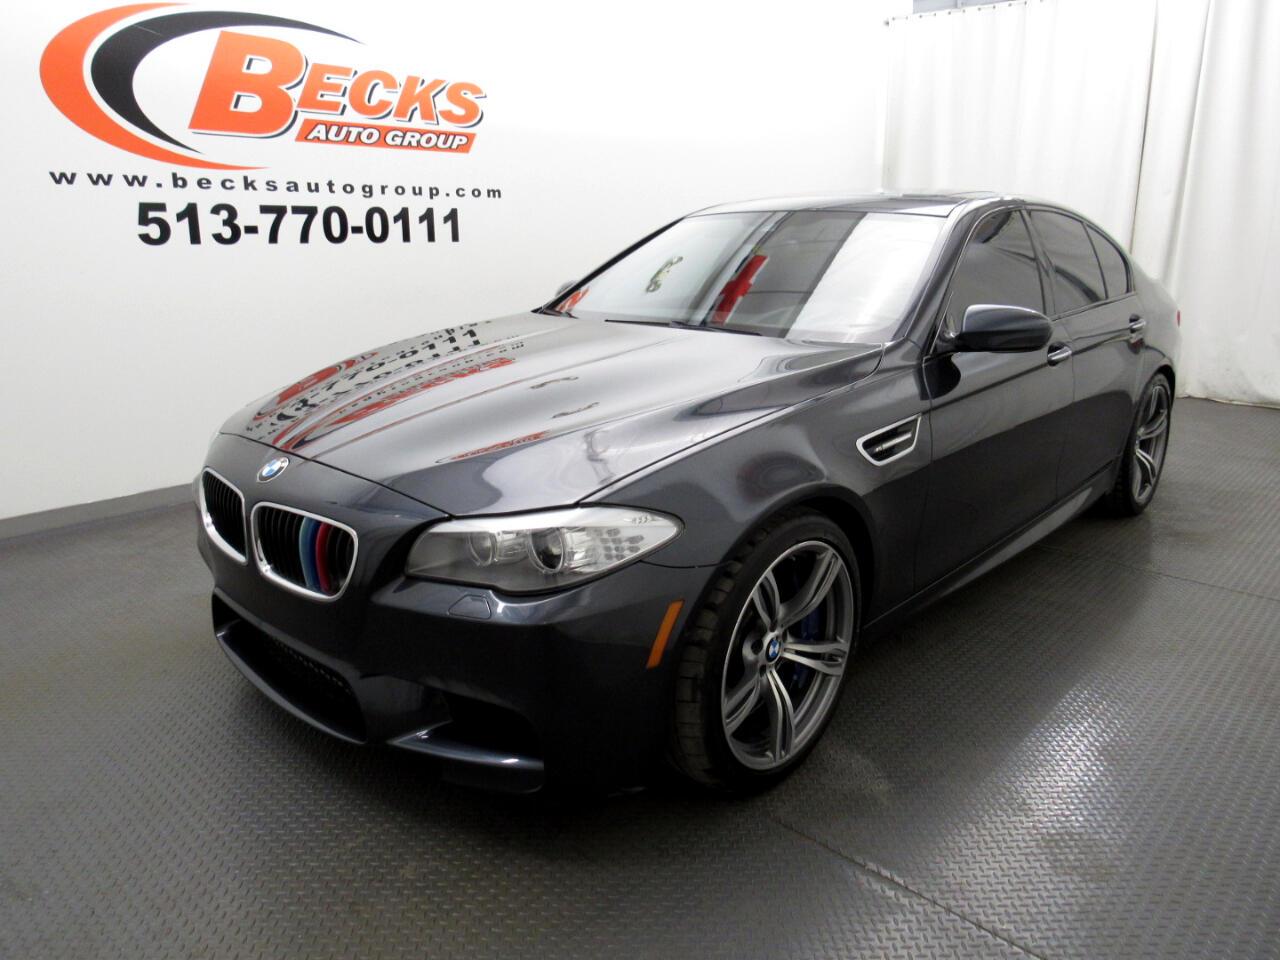 2013 BMW M5 4dr Sdn